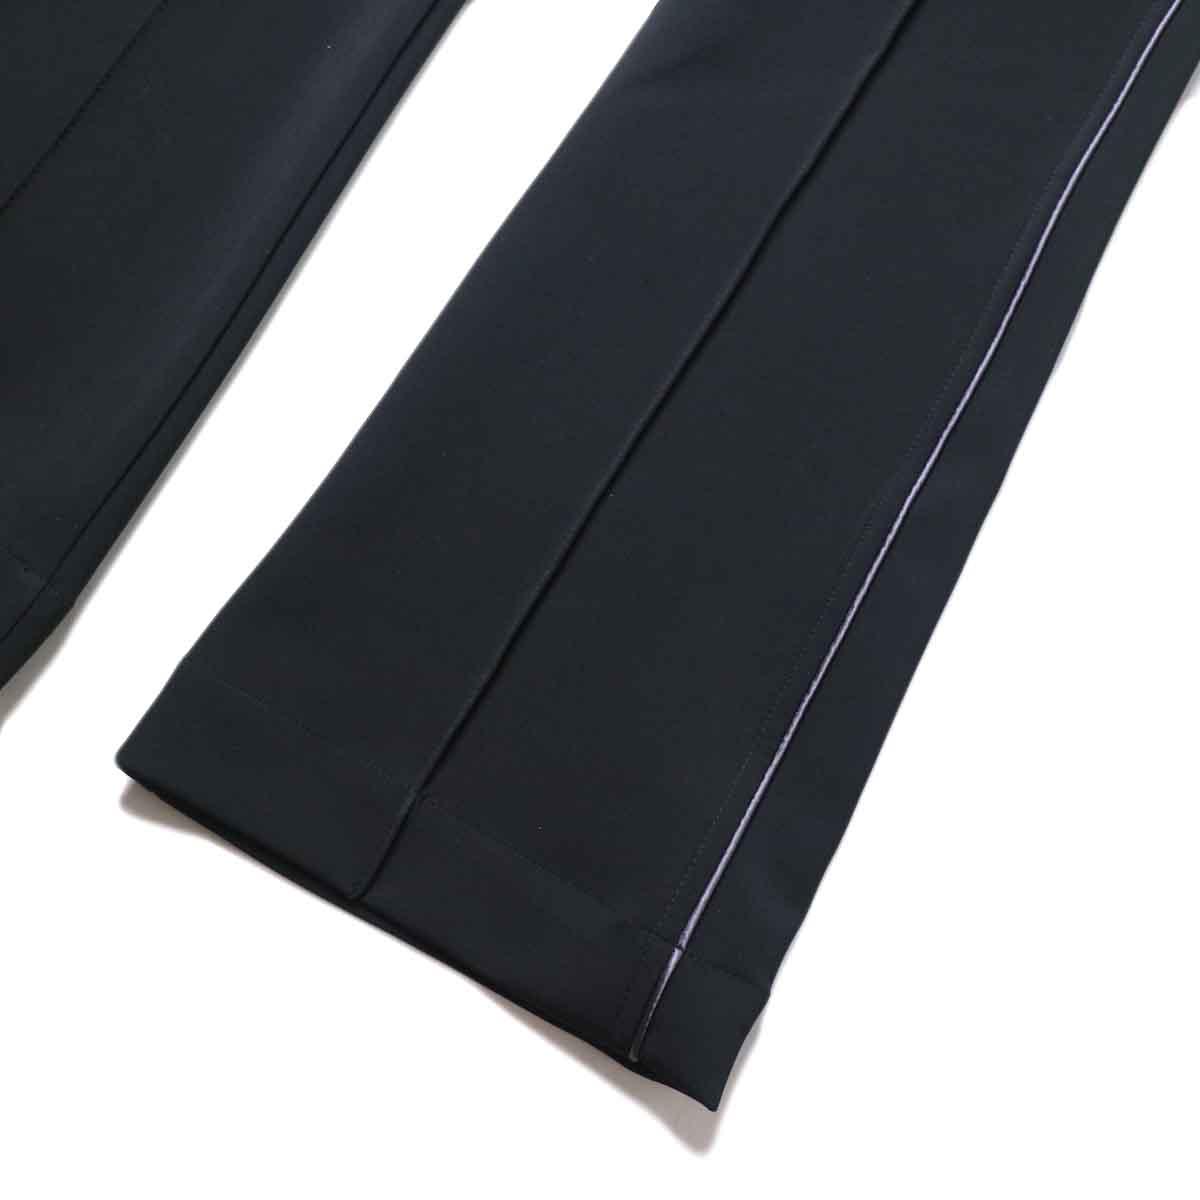 Needles / PIPING COWBOY PANT - PE/PU DOUBLE CLOTH (Black)裾